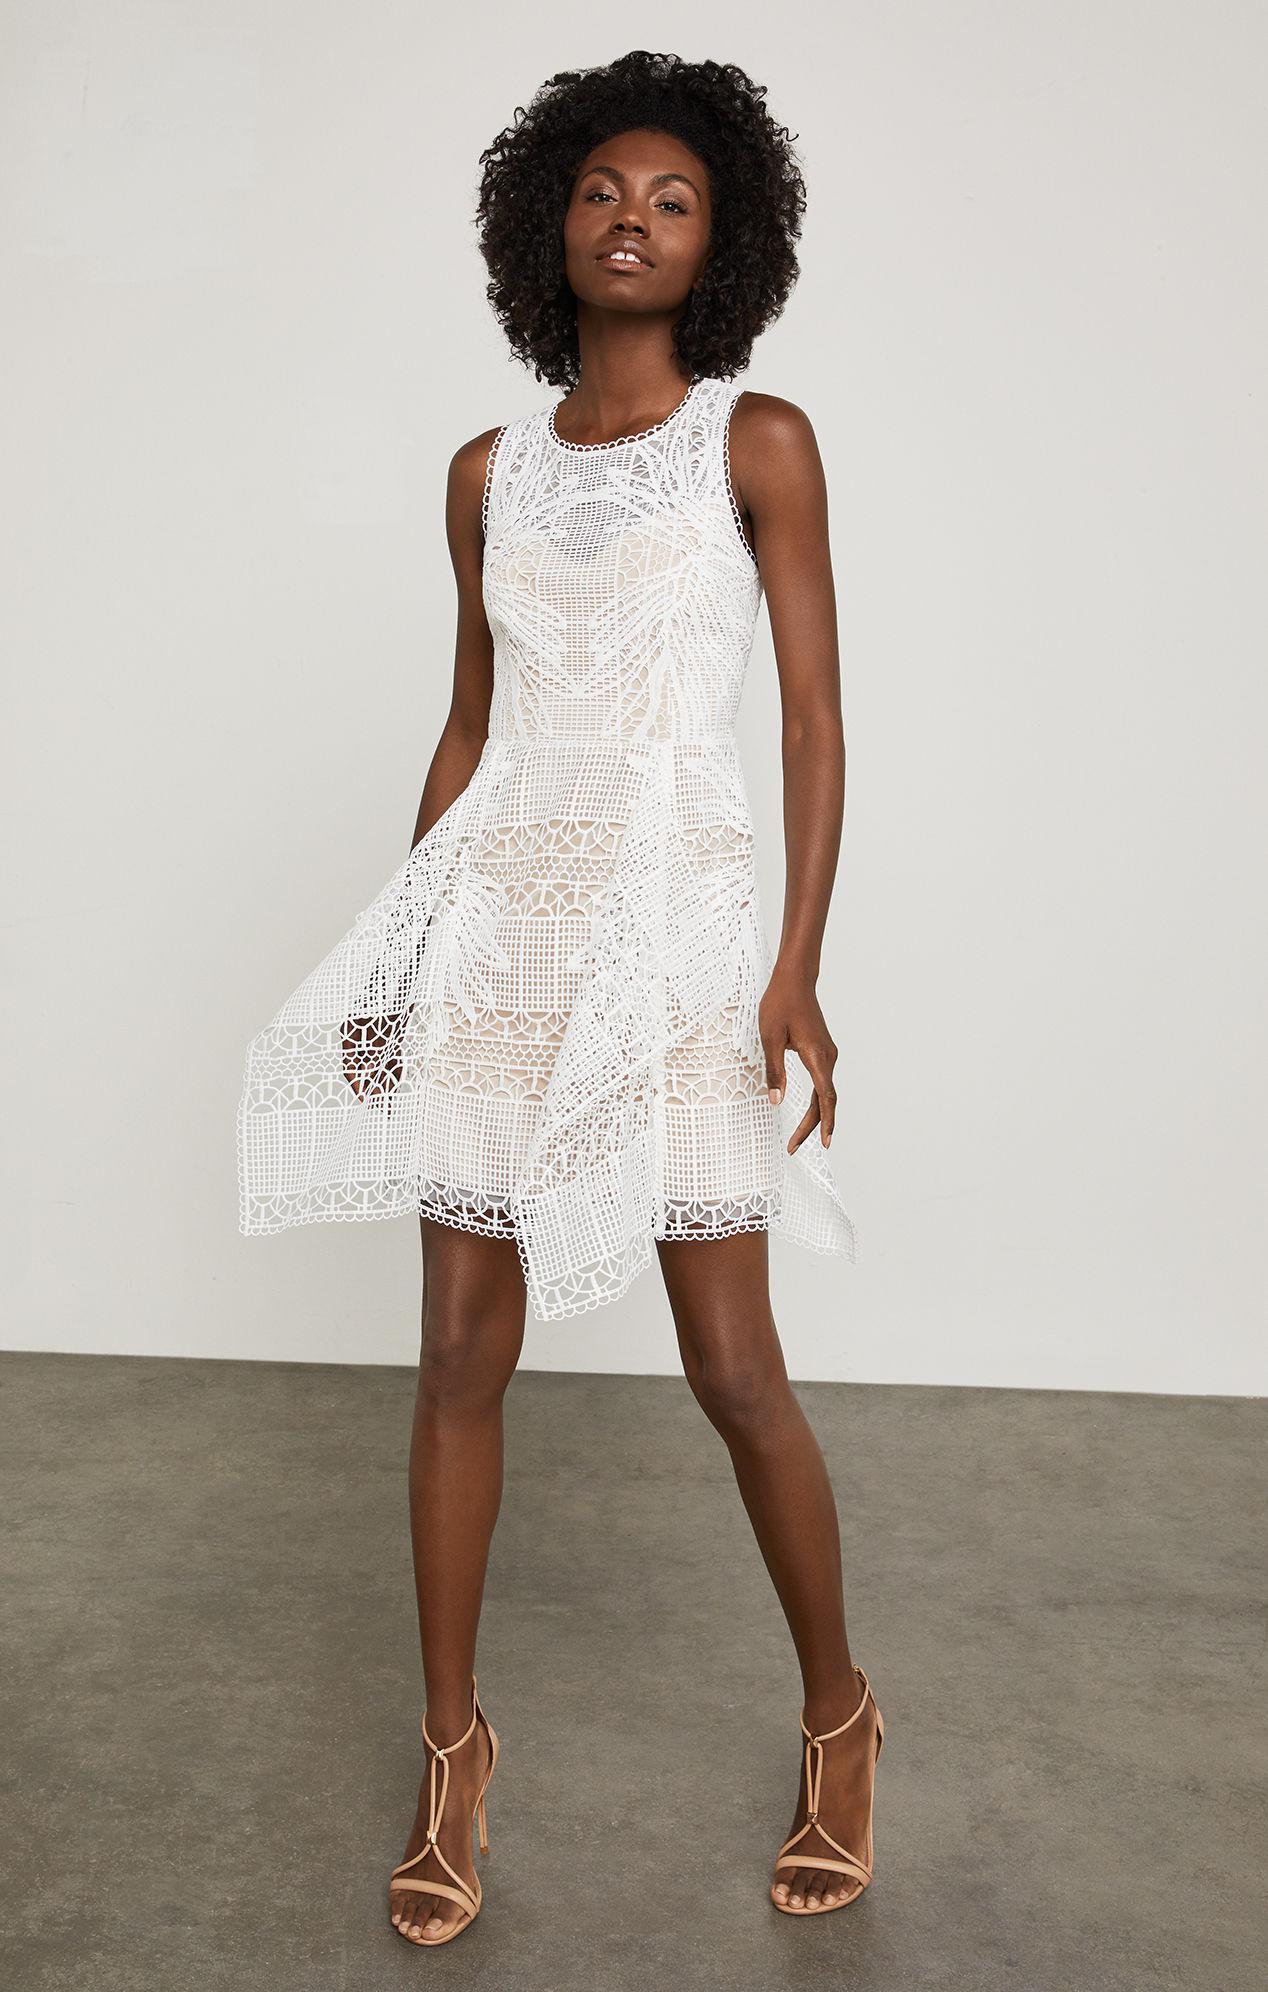 d0eacc4b38e106 Bcbgmaxazria Bcbg Sleeveless Abstract Lace Dress in White - Lyst